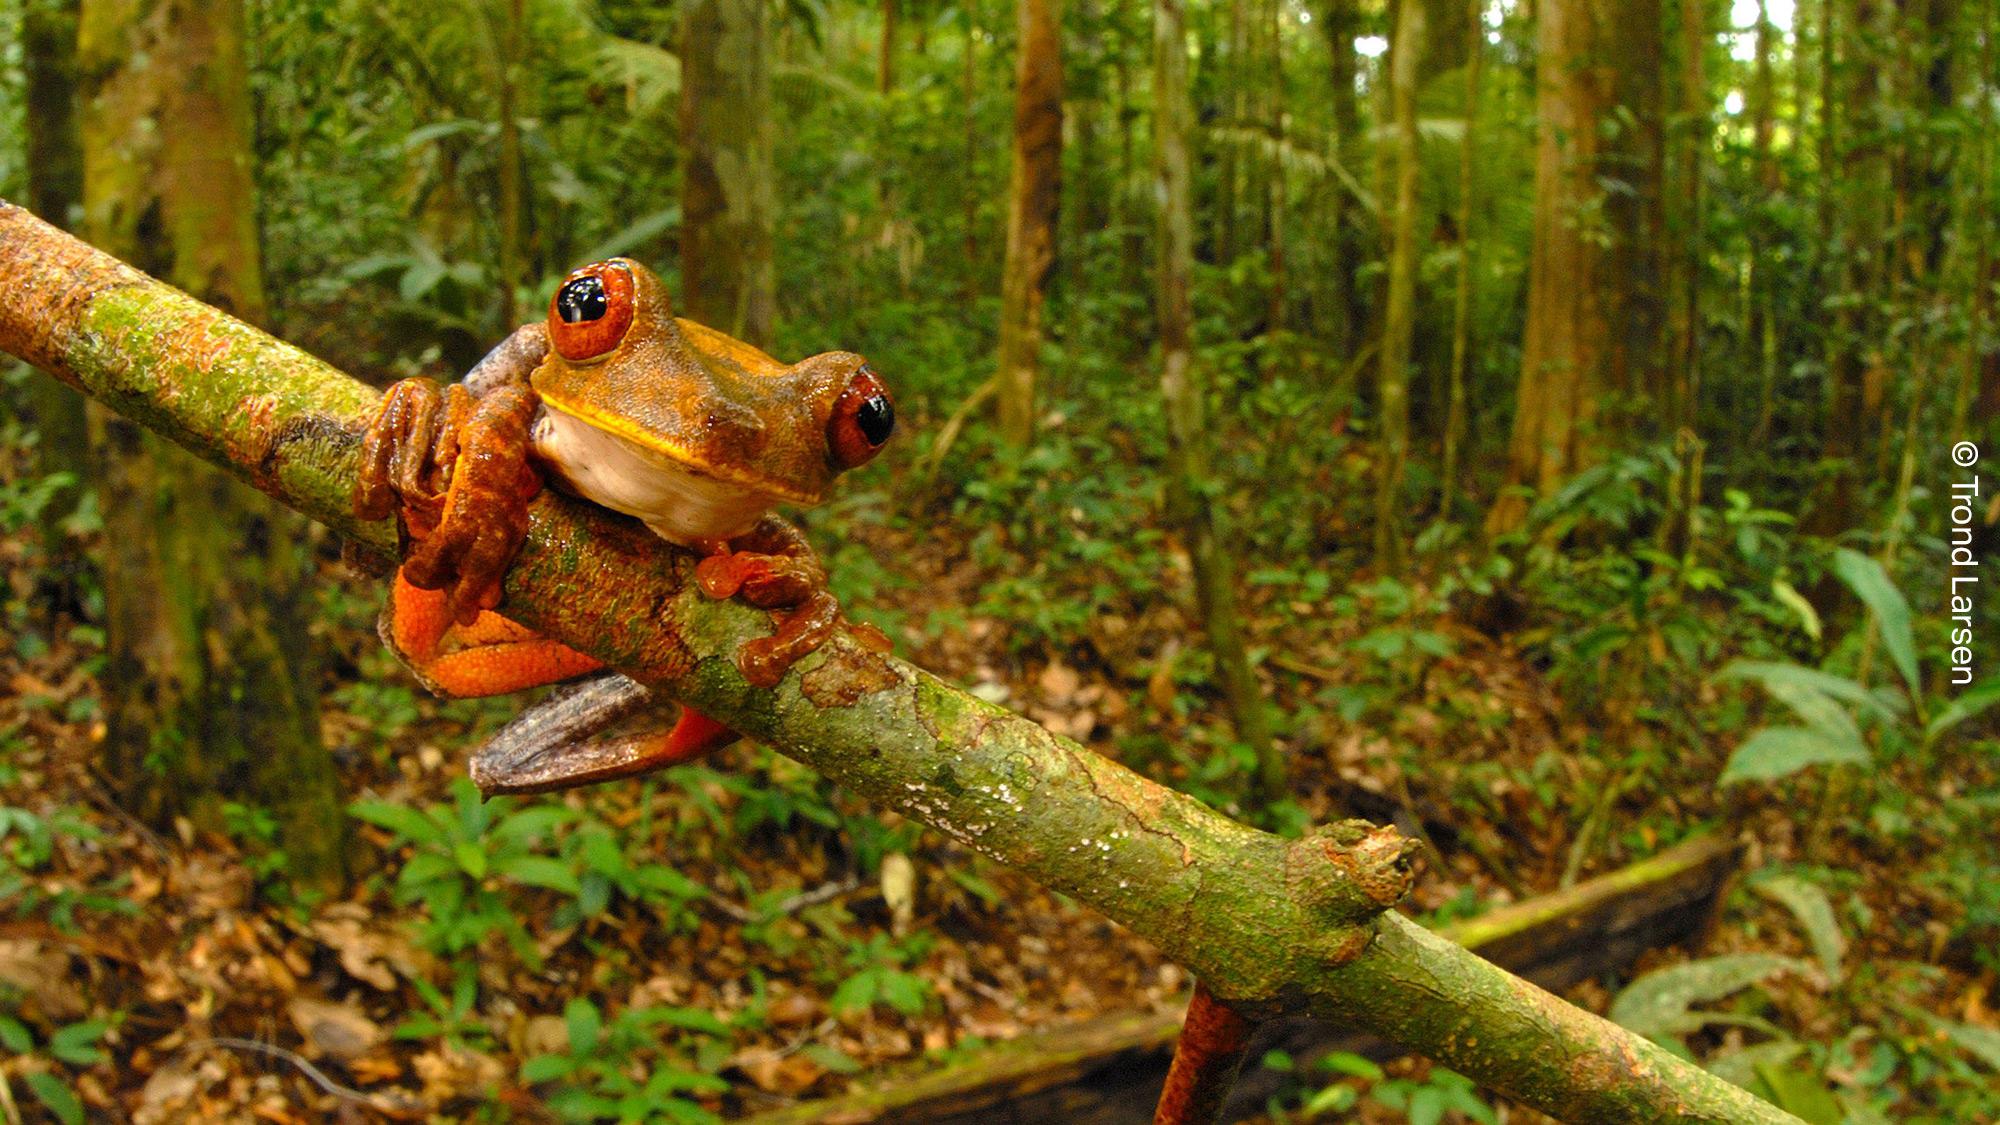 A native tree frog found in Brazil's Amazon region